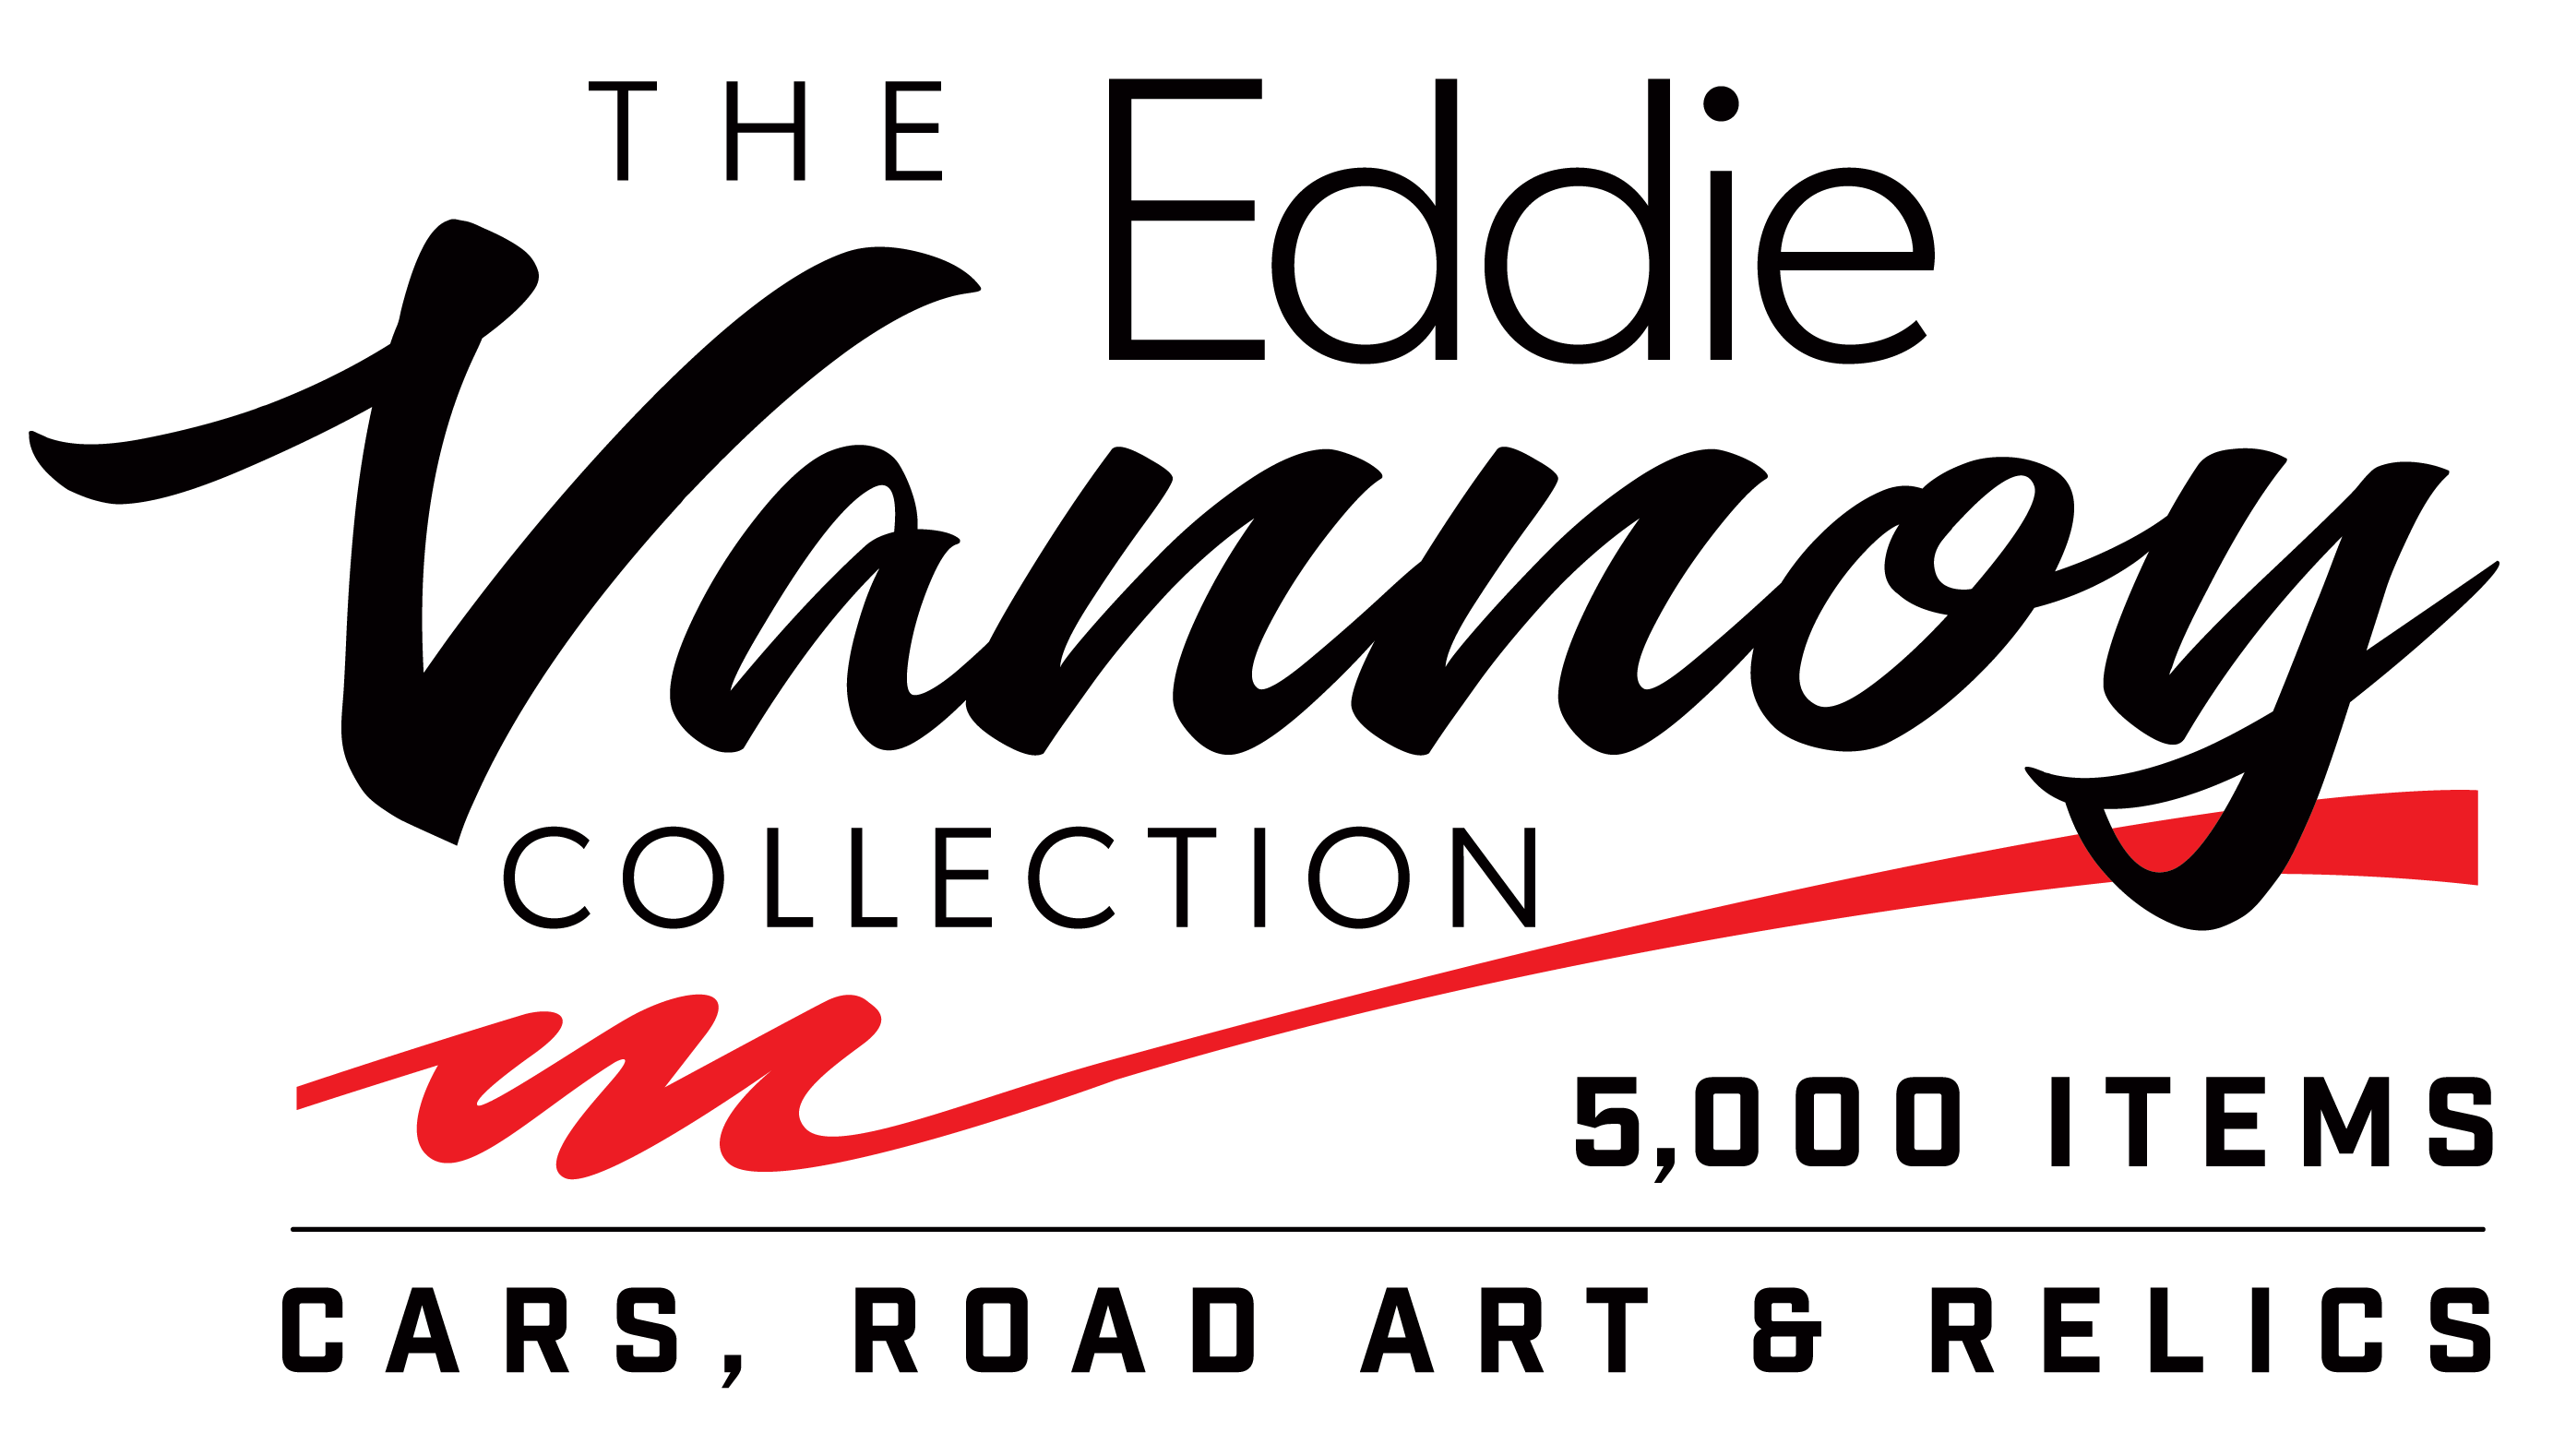 200401 The Eddie Vannoy Collection logo